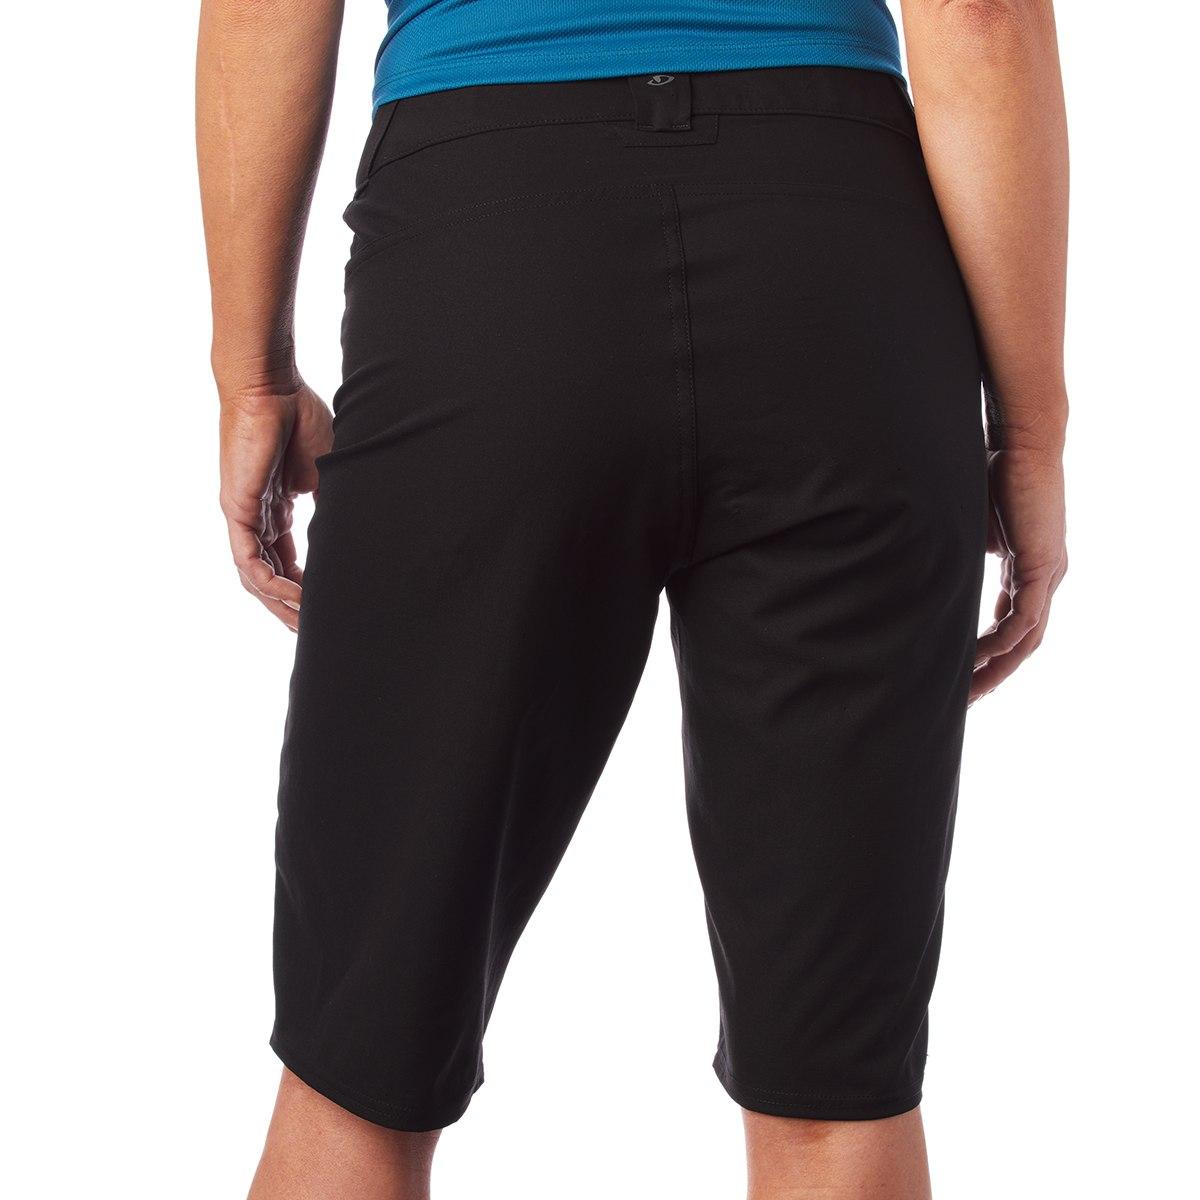 Image of Giro Arc MTB Womens Shorts - black